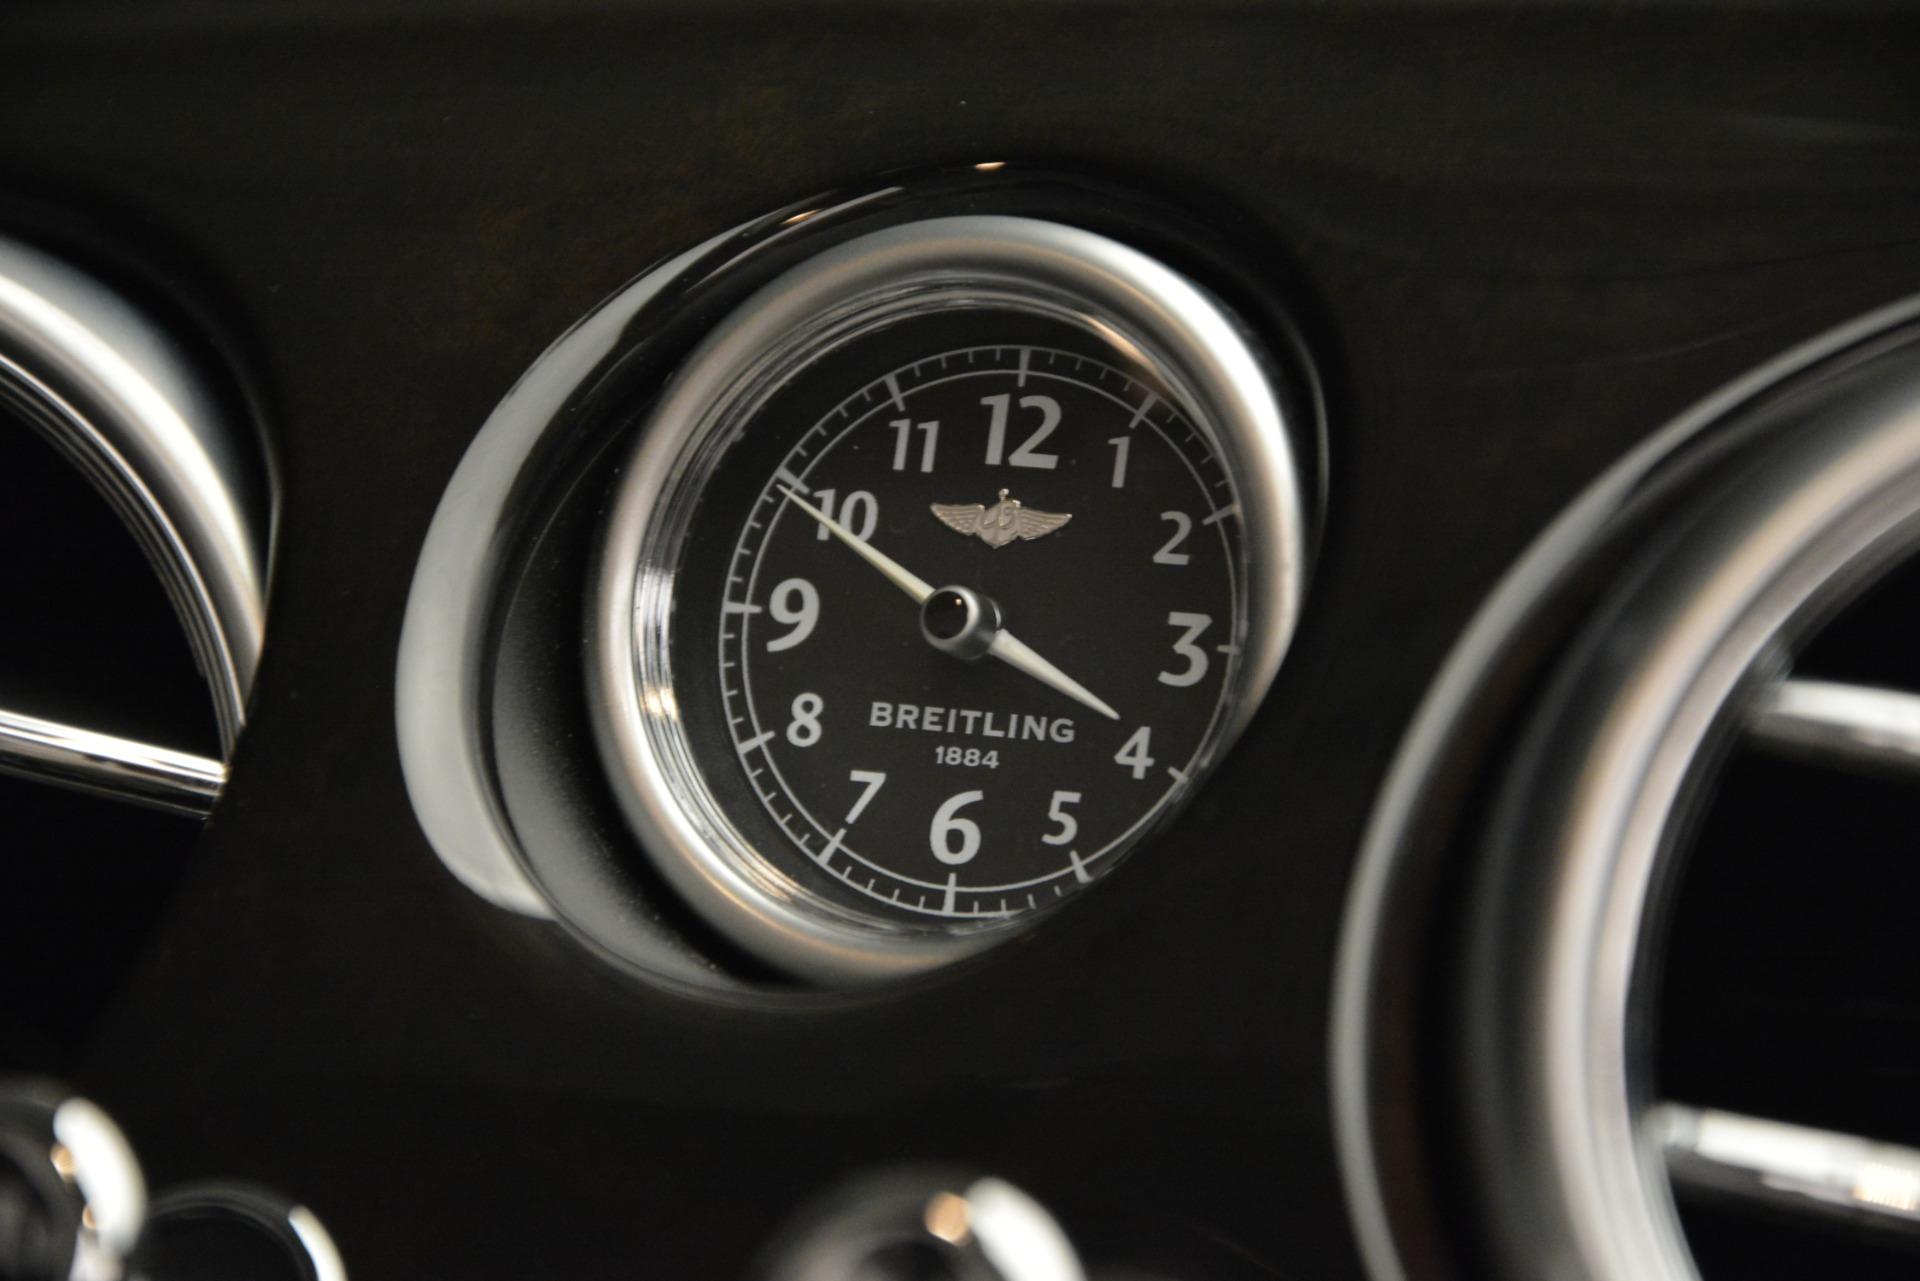 Used 2010 Bentley Continental GT Speed For Sale In Westport, CT 2677_p26